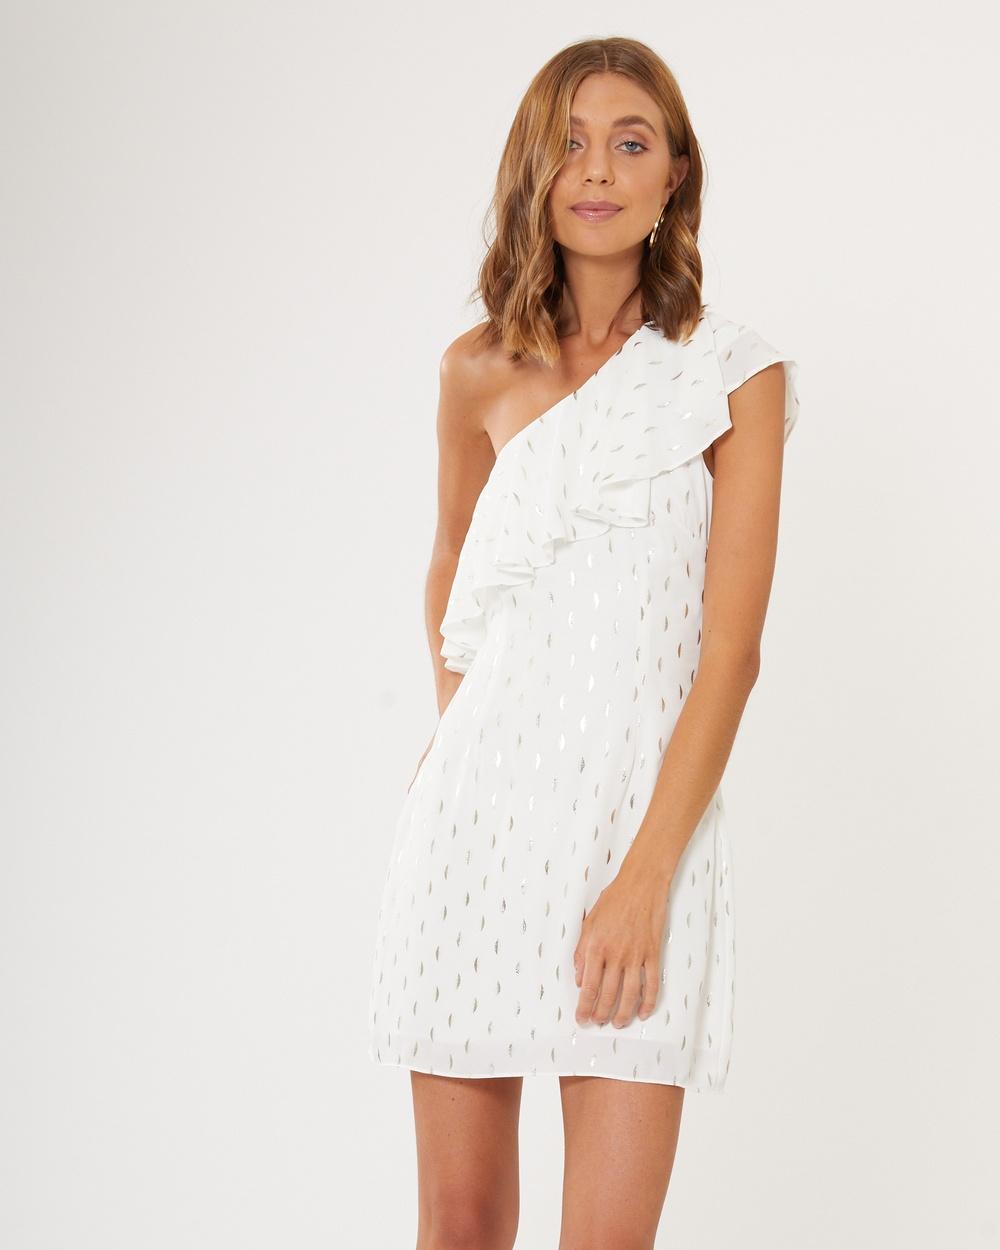 Calli Lola Frill Dress Printed Dresses White Lola Frill Dress